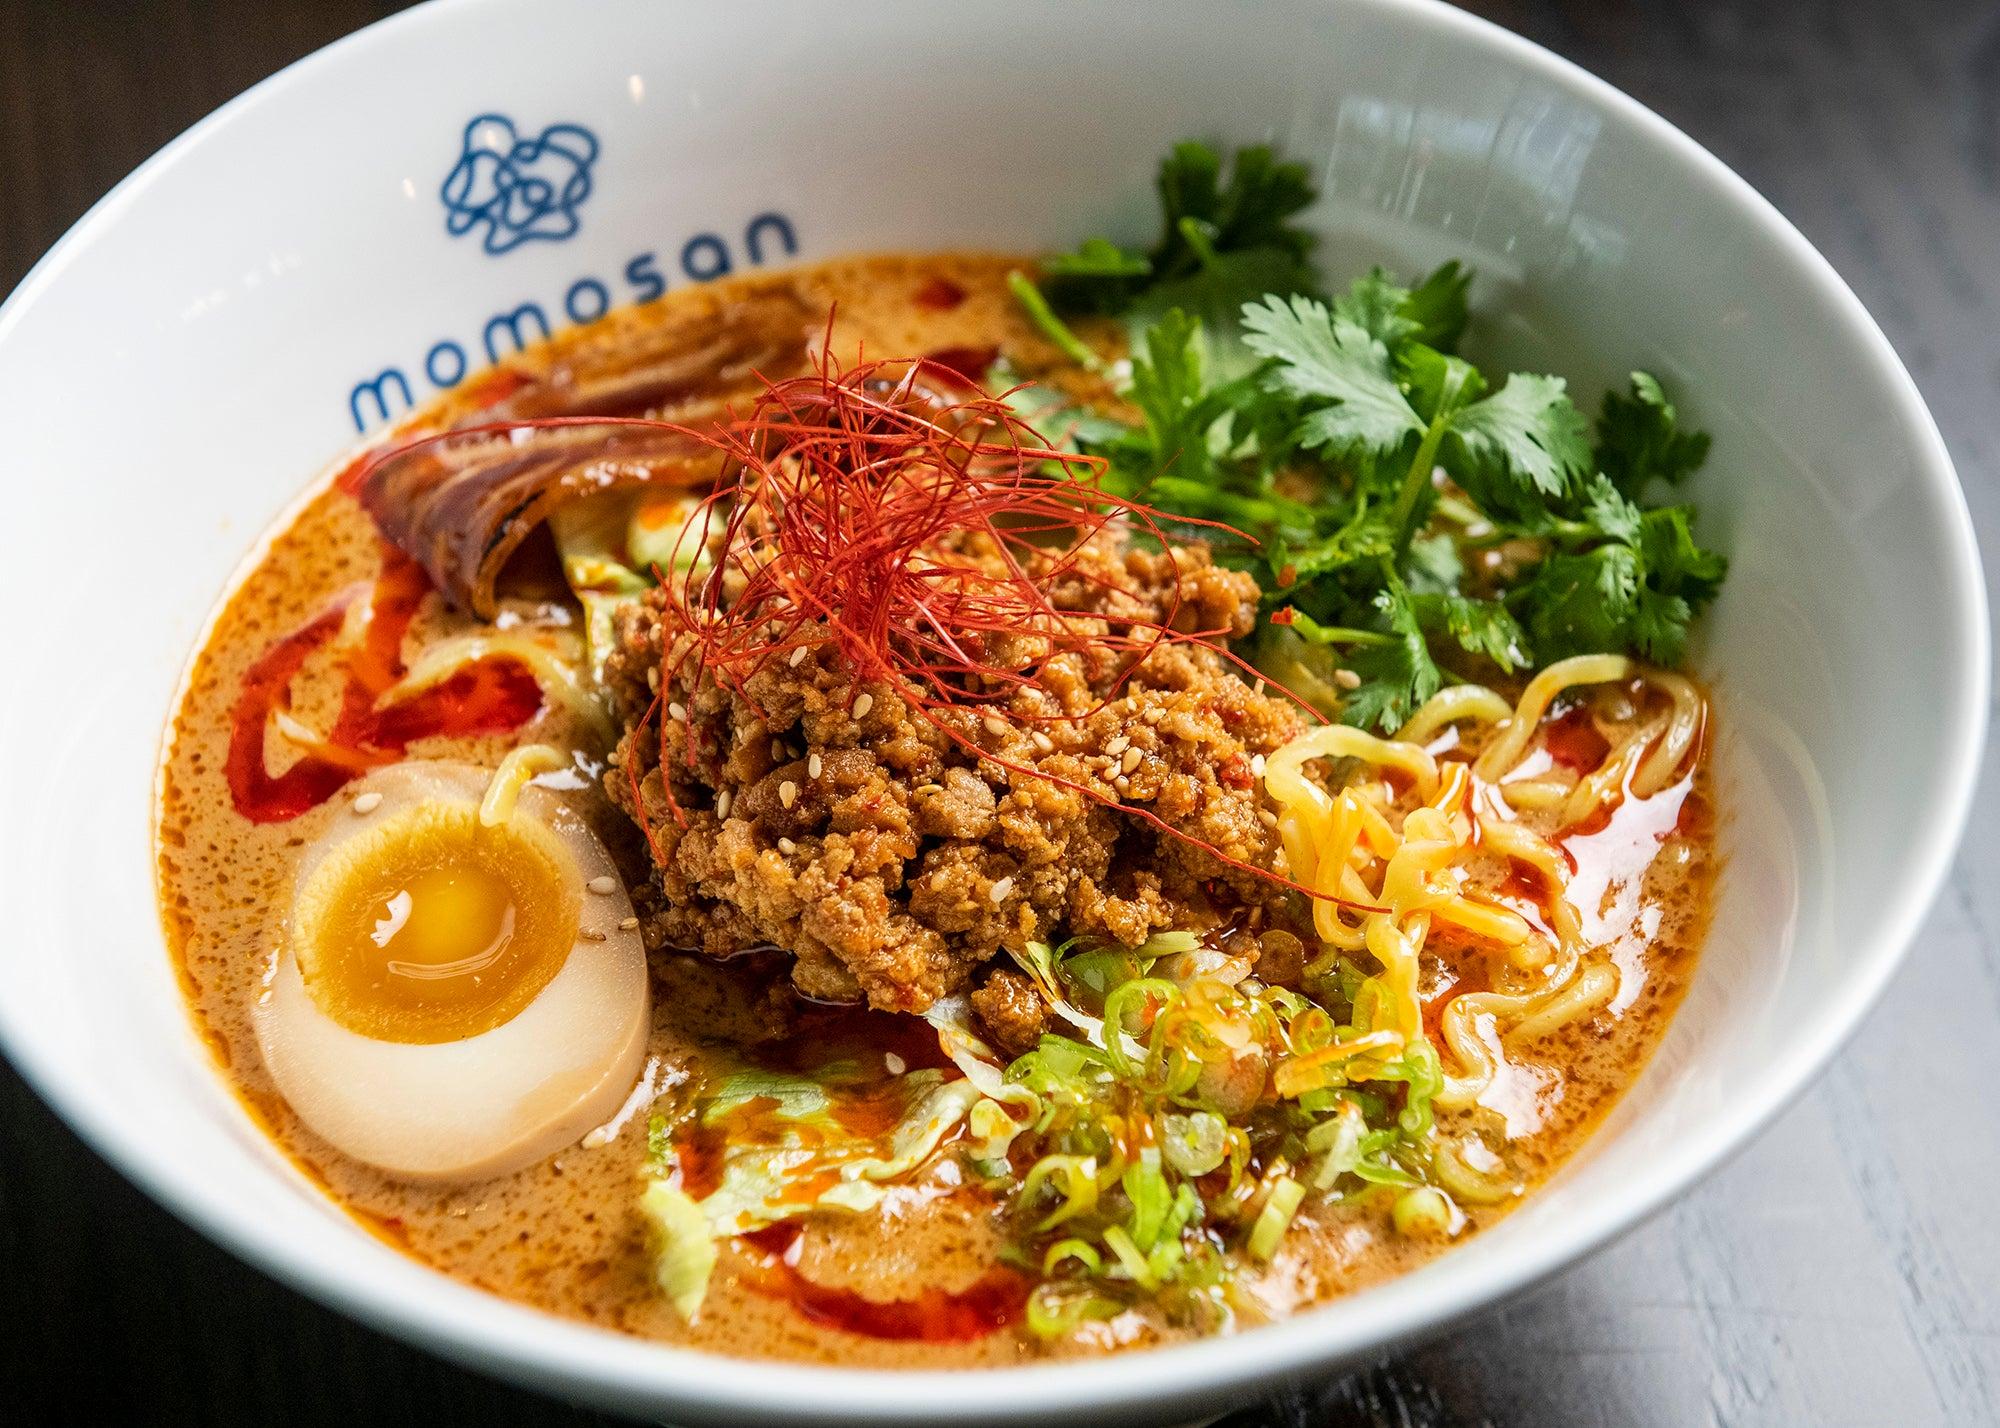 Tan-Tan ramen at Momosan